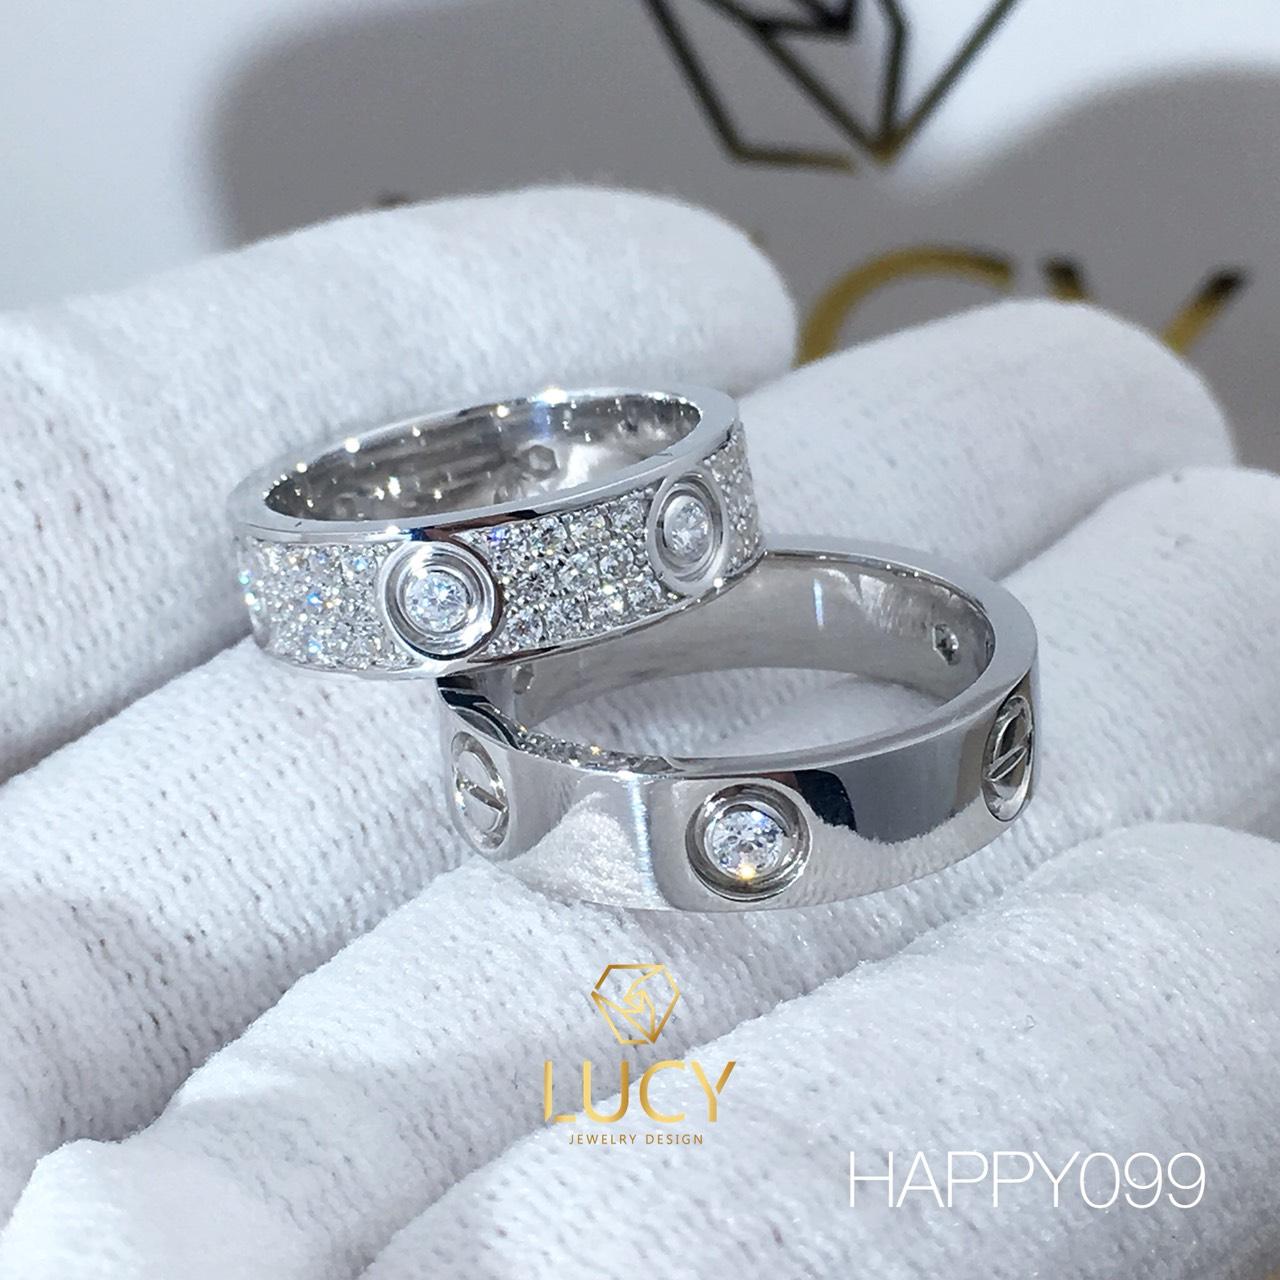 HAPPY099 Nhẫn cưới thiết kế - Lucy Jewelry